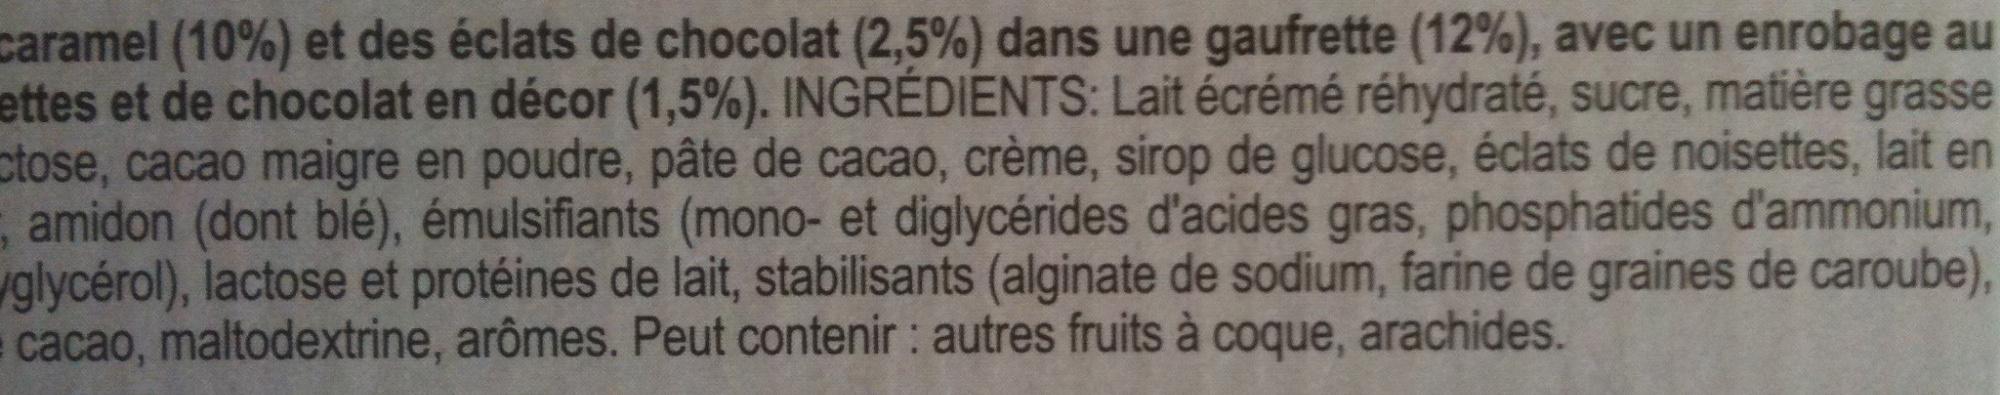 Cornetto Enigma - Chocolat & Coeur au caramel - Ingrédients